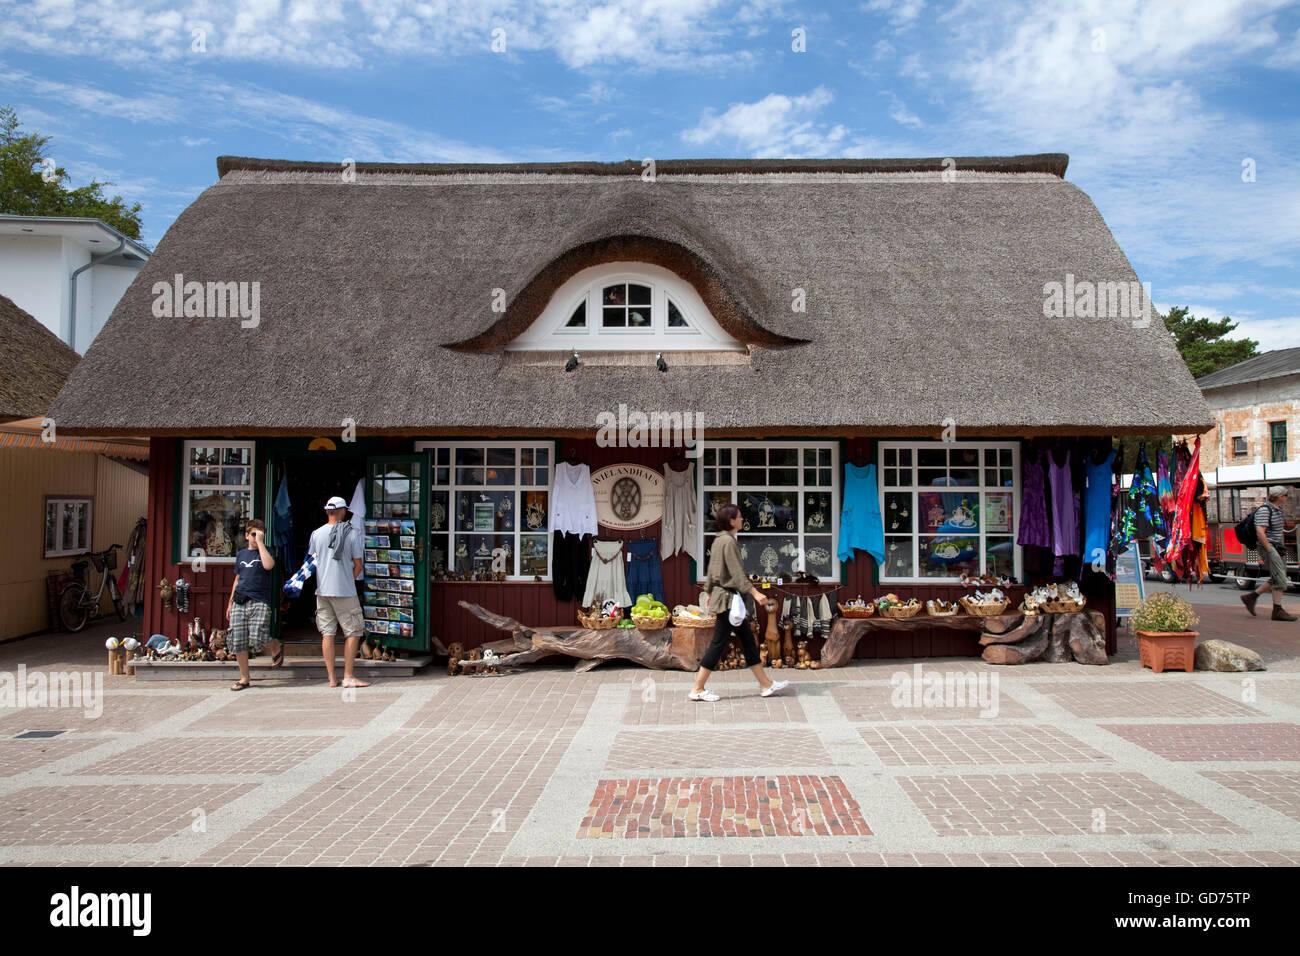 Souvenir Shop auf der Promenade Ostseebad Prerow